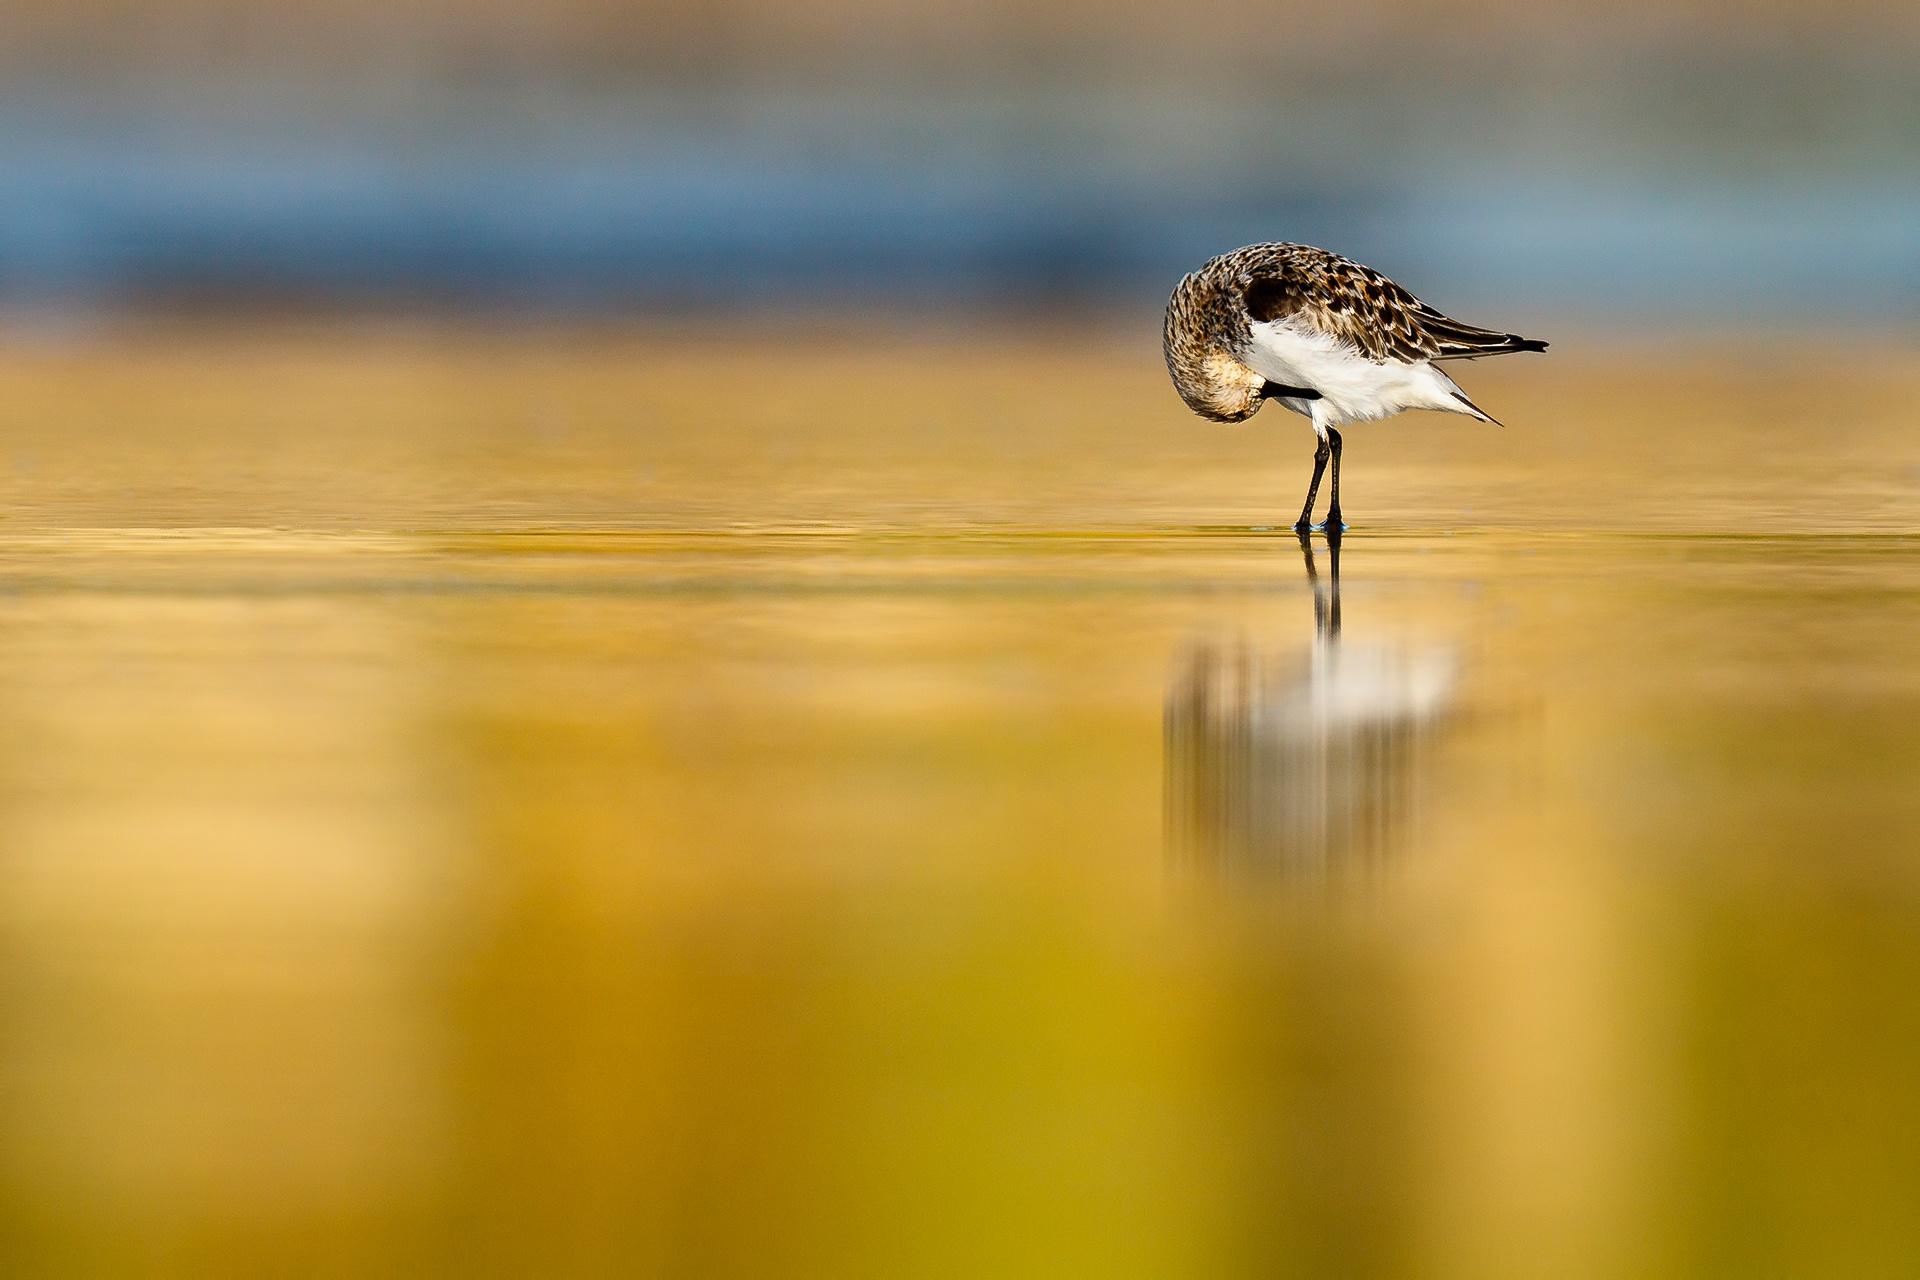 Reverence - Mario Suarez - Portfolio Natural, Fotografía de Naturaleza de Autor